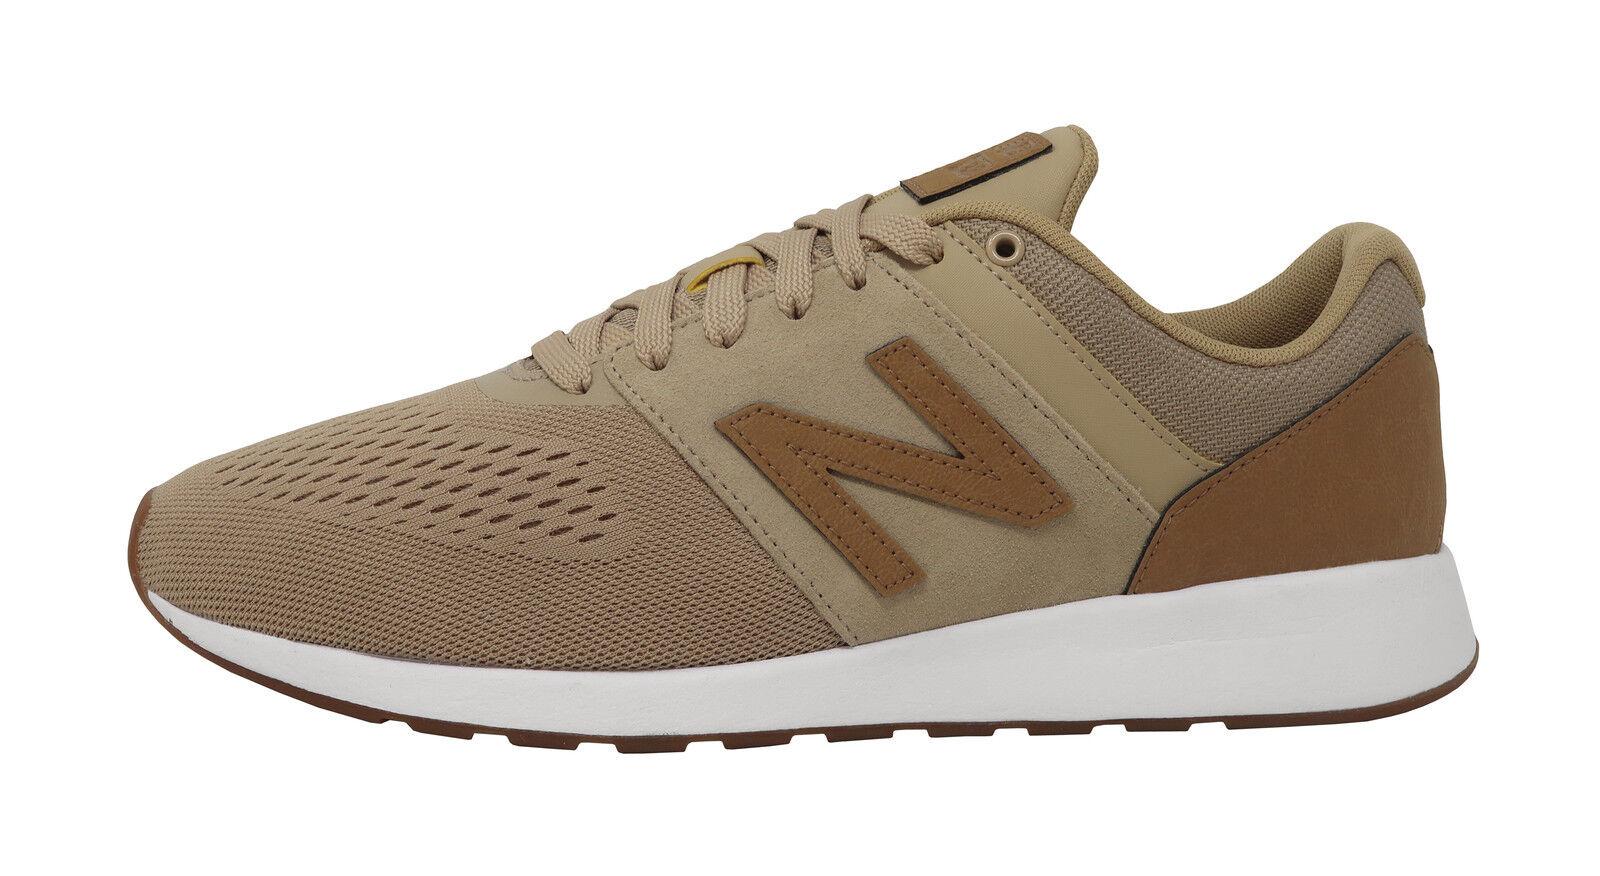 New Balance Men's 24 Running shoes MRL24CRB - Beige Brown